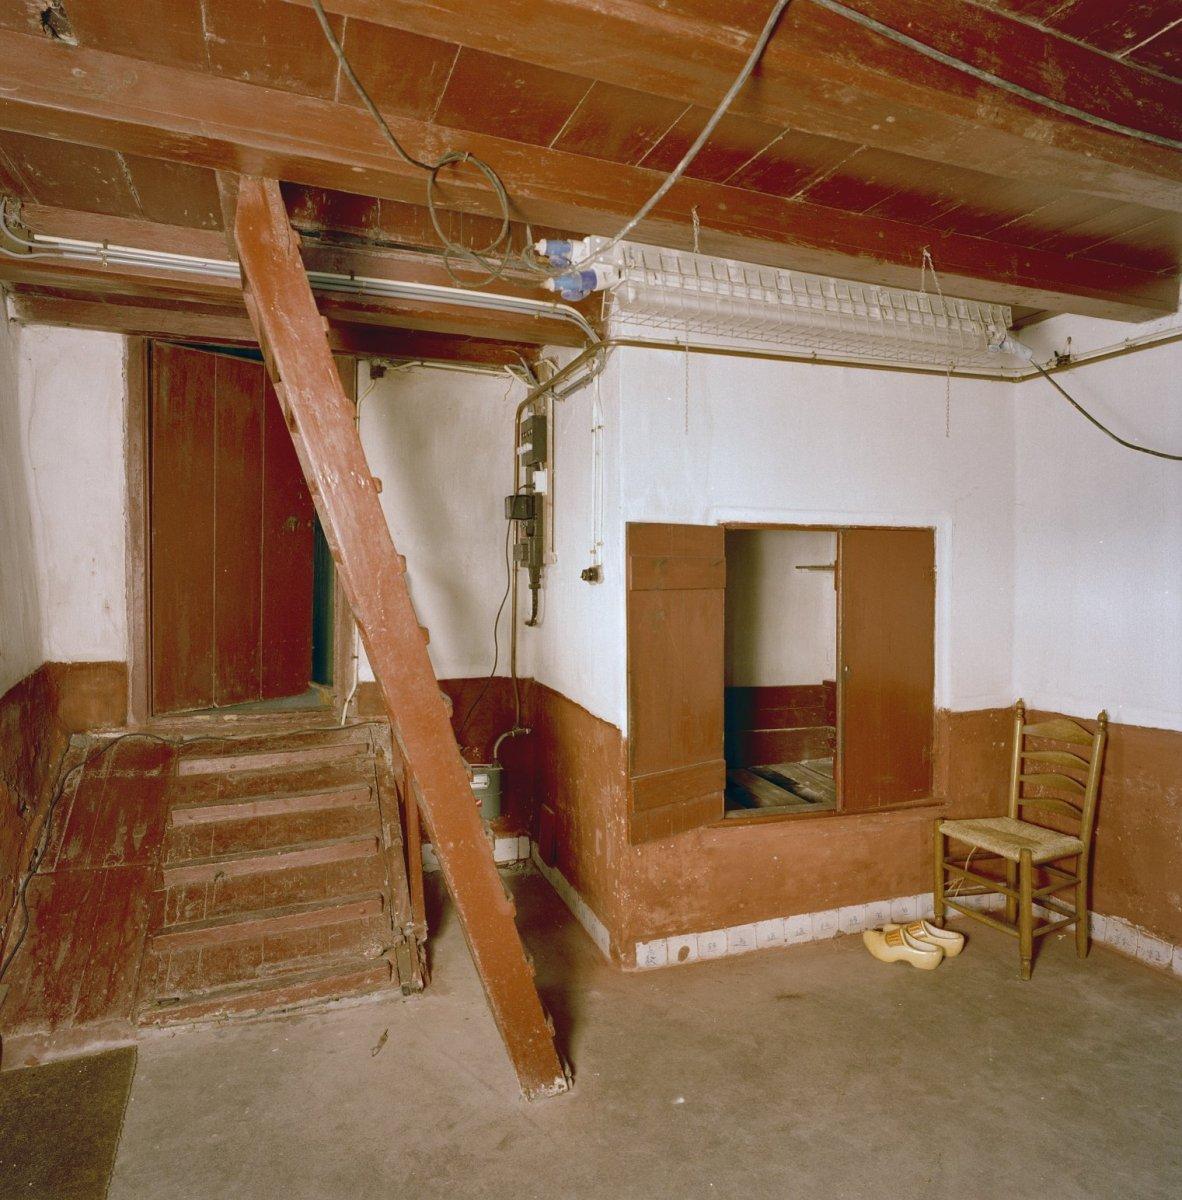 File interieur voorhuis met bedstede trap naar opkamer kelderluik delfts blauwe plinten - Model interieur trap ...